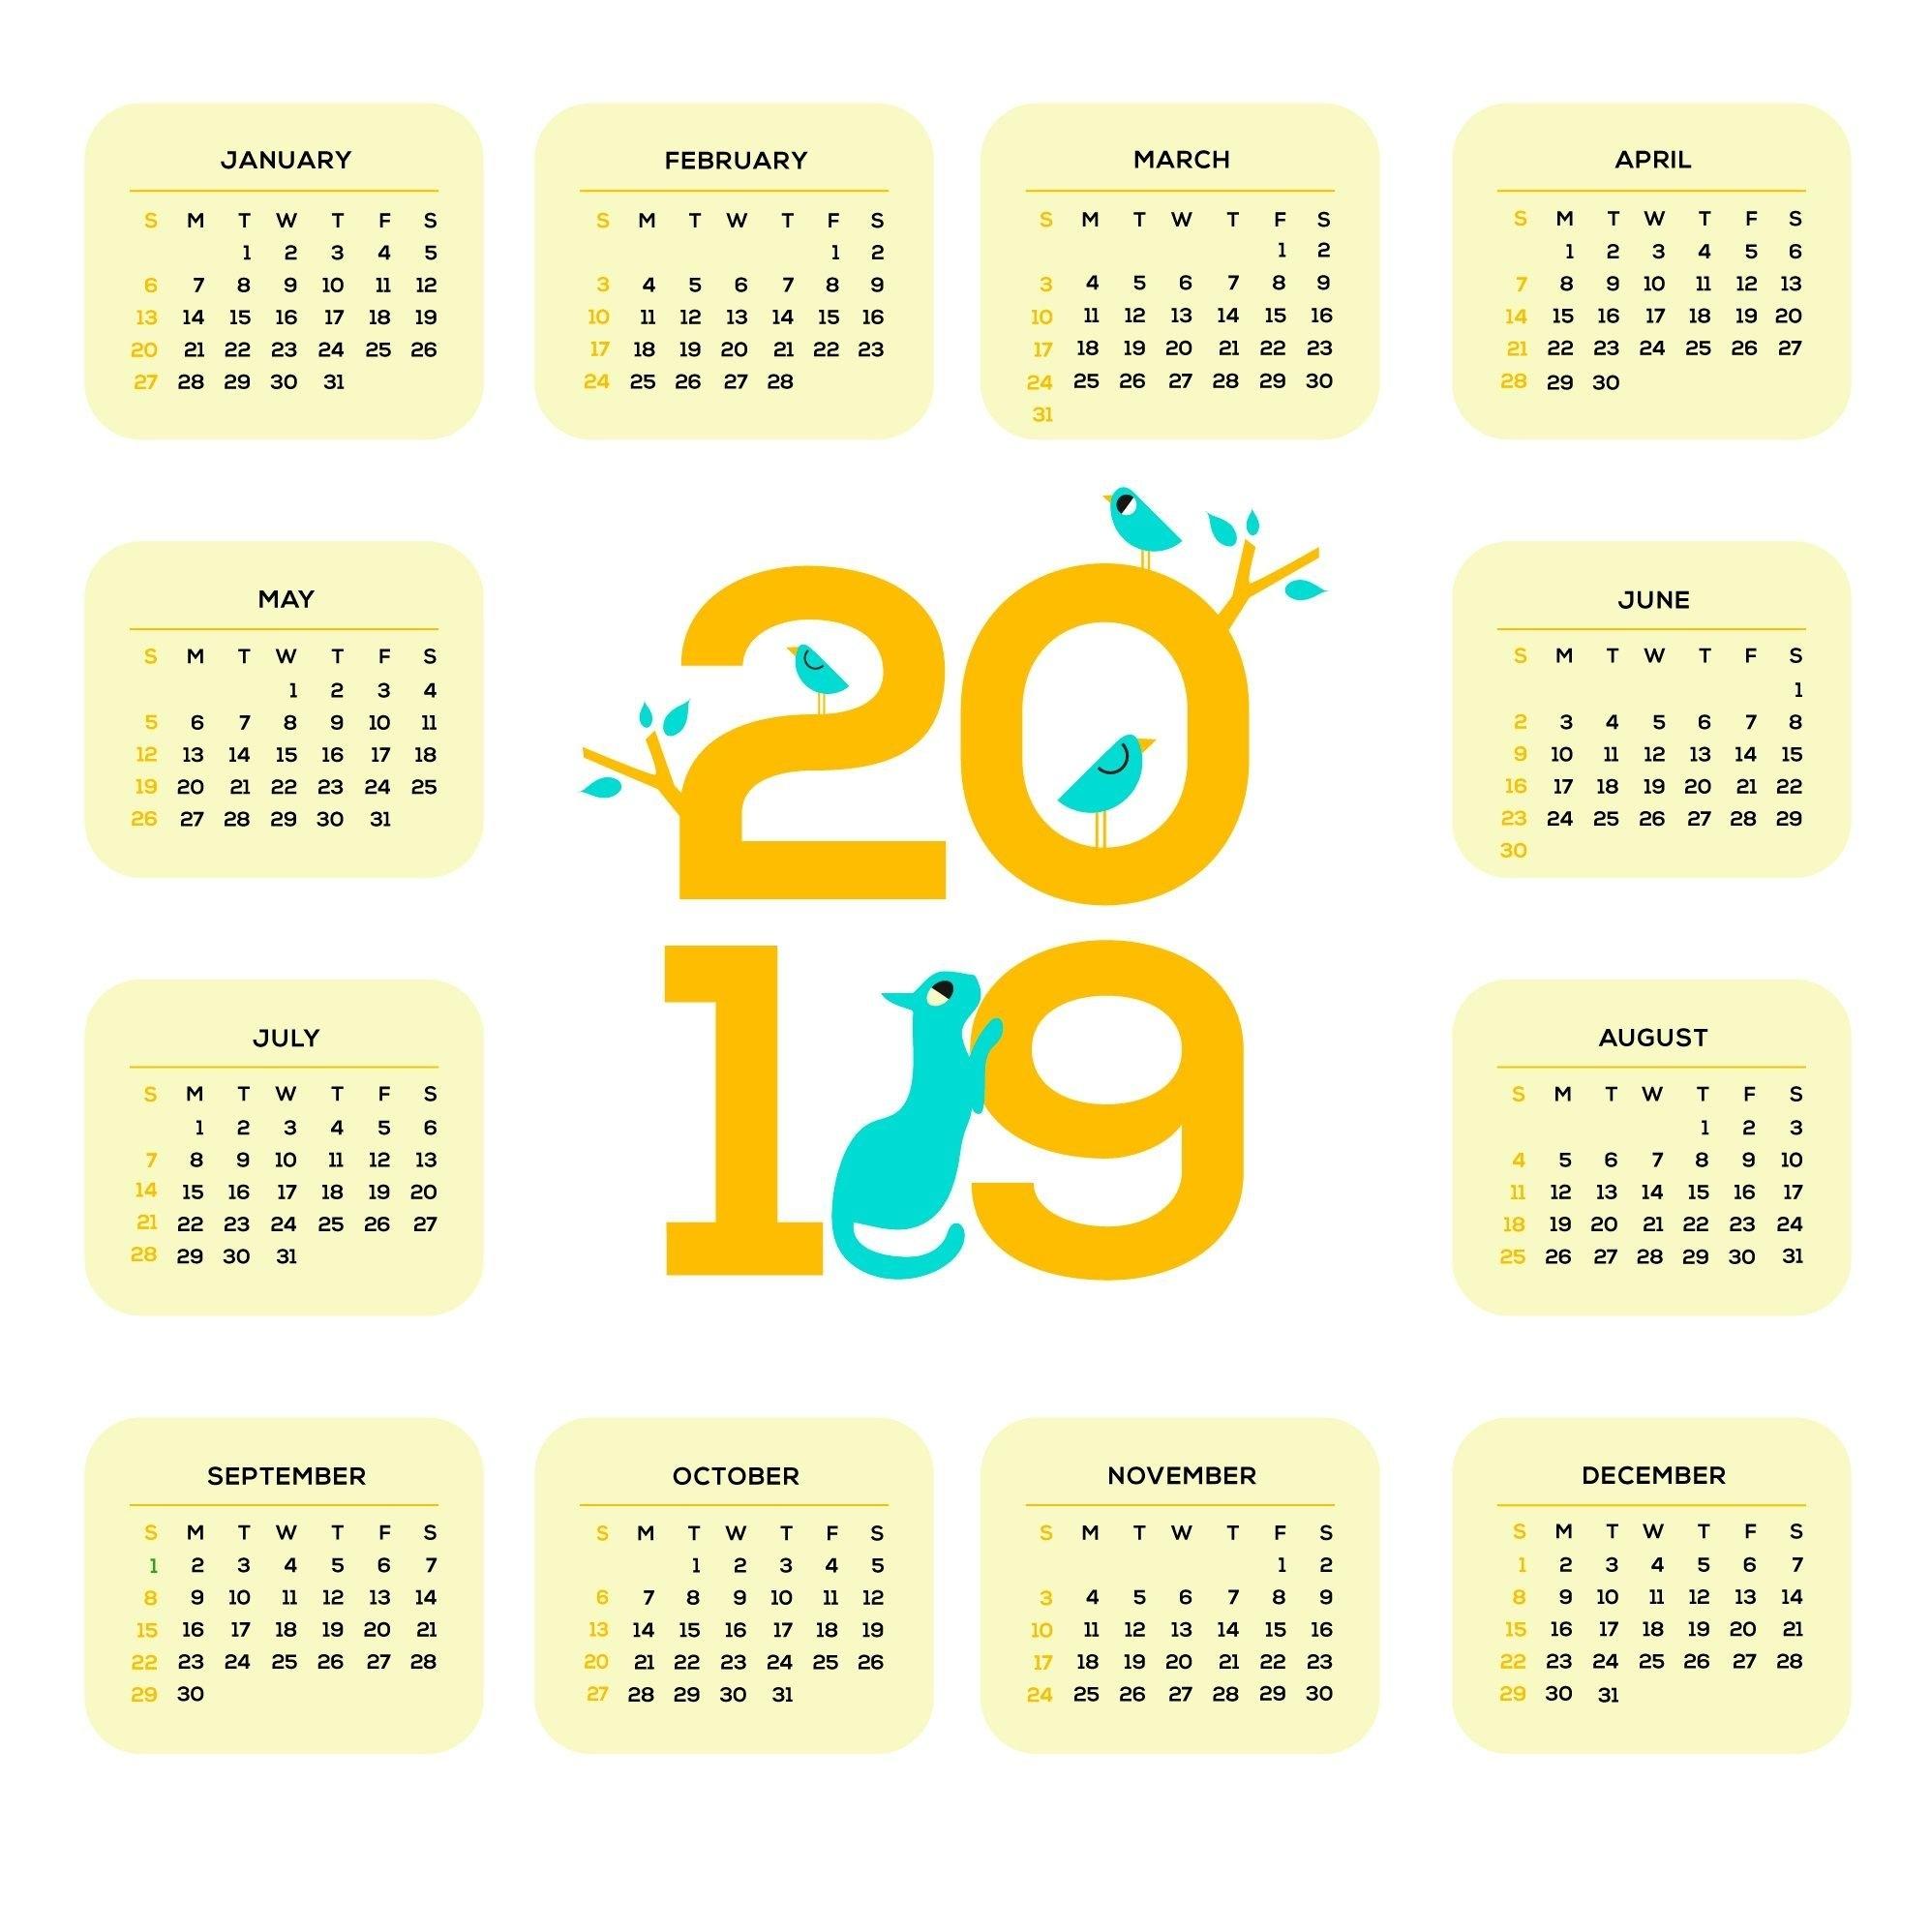 Printable 2019 One Page Calendar | Monthly Calendar Templates Calendar 2019 One Page Printable